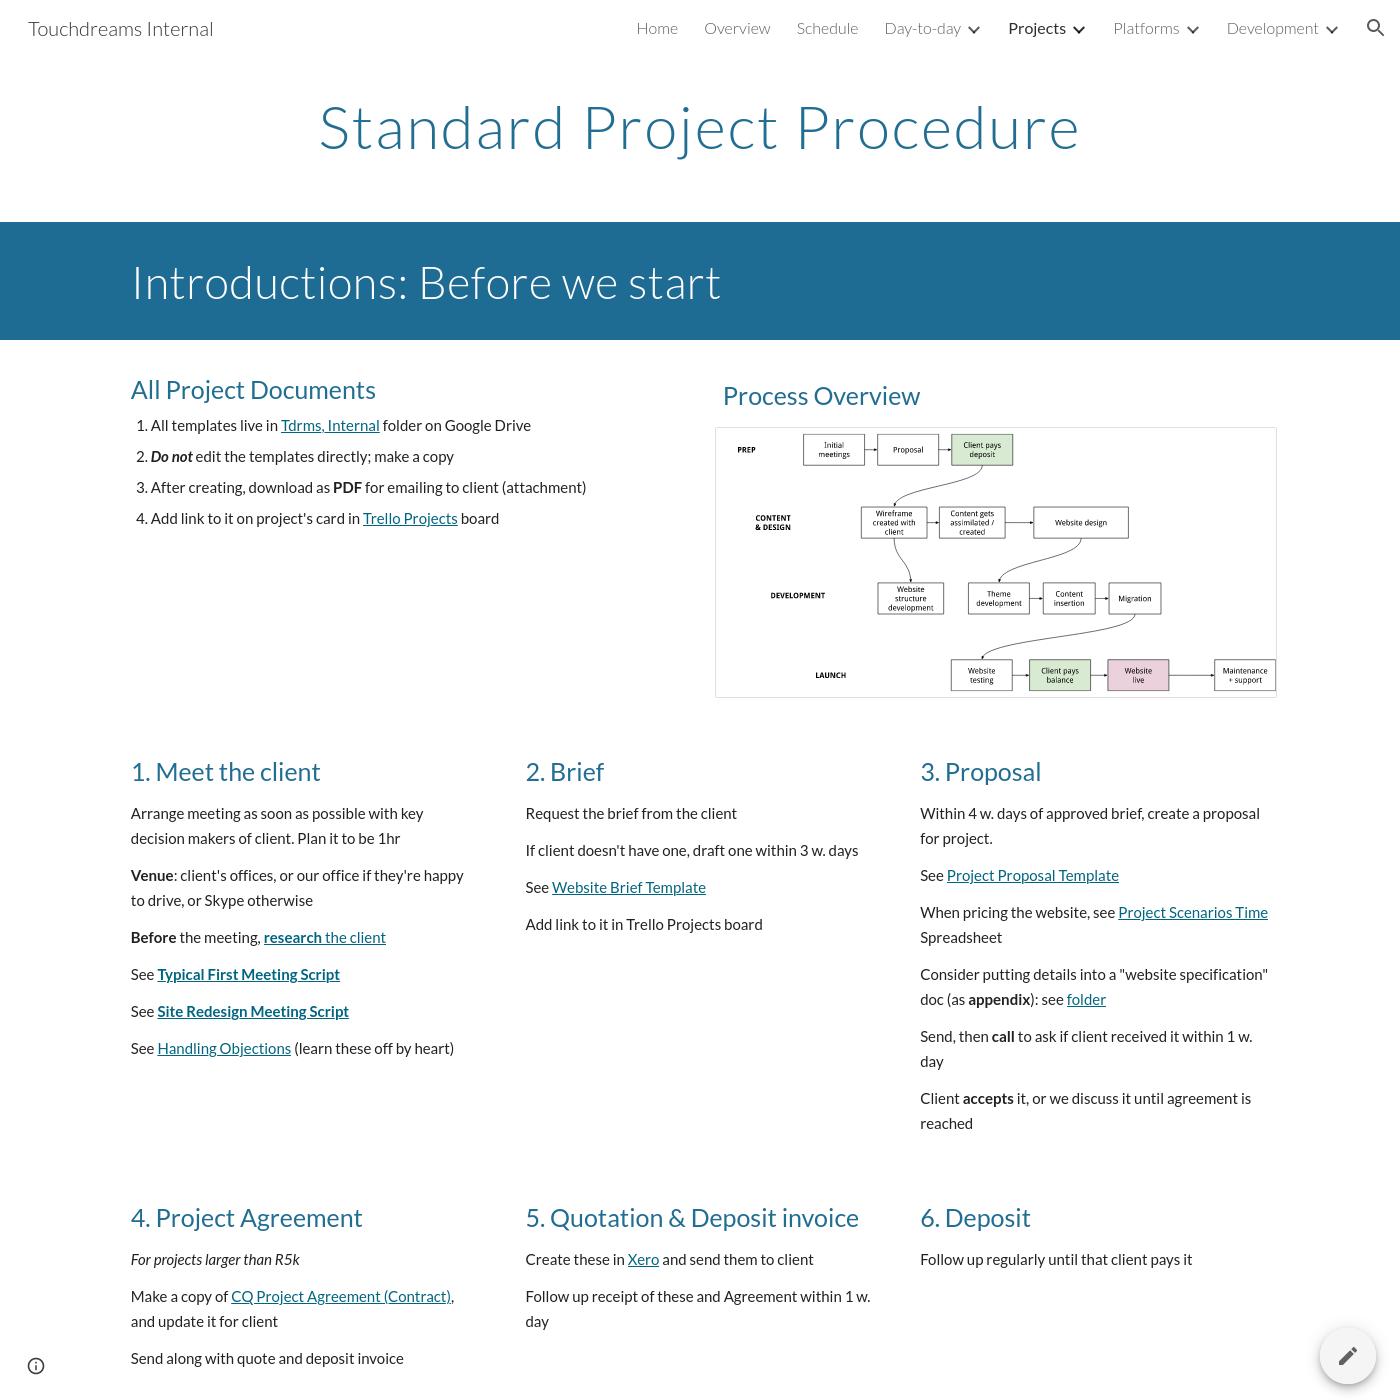 Touchdreams Websites team knowledge site screenshot